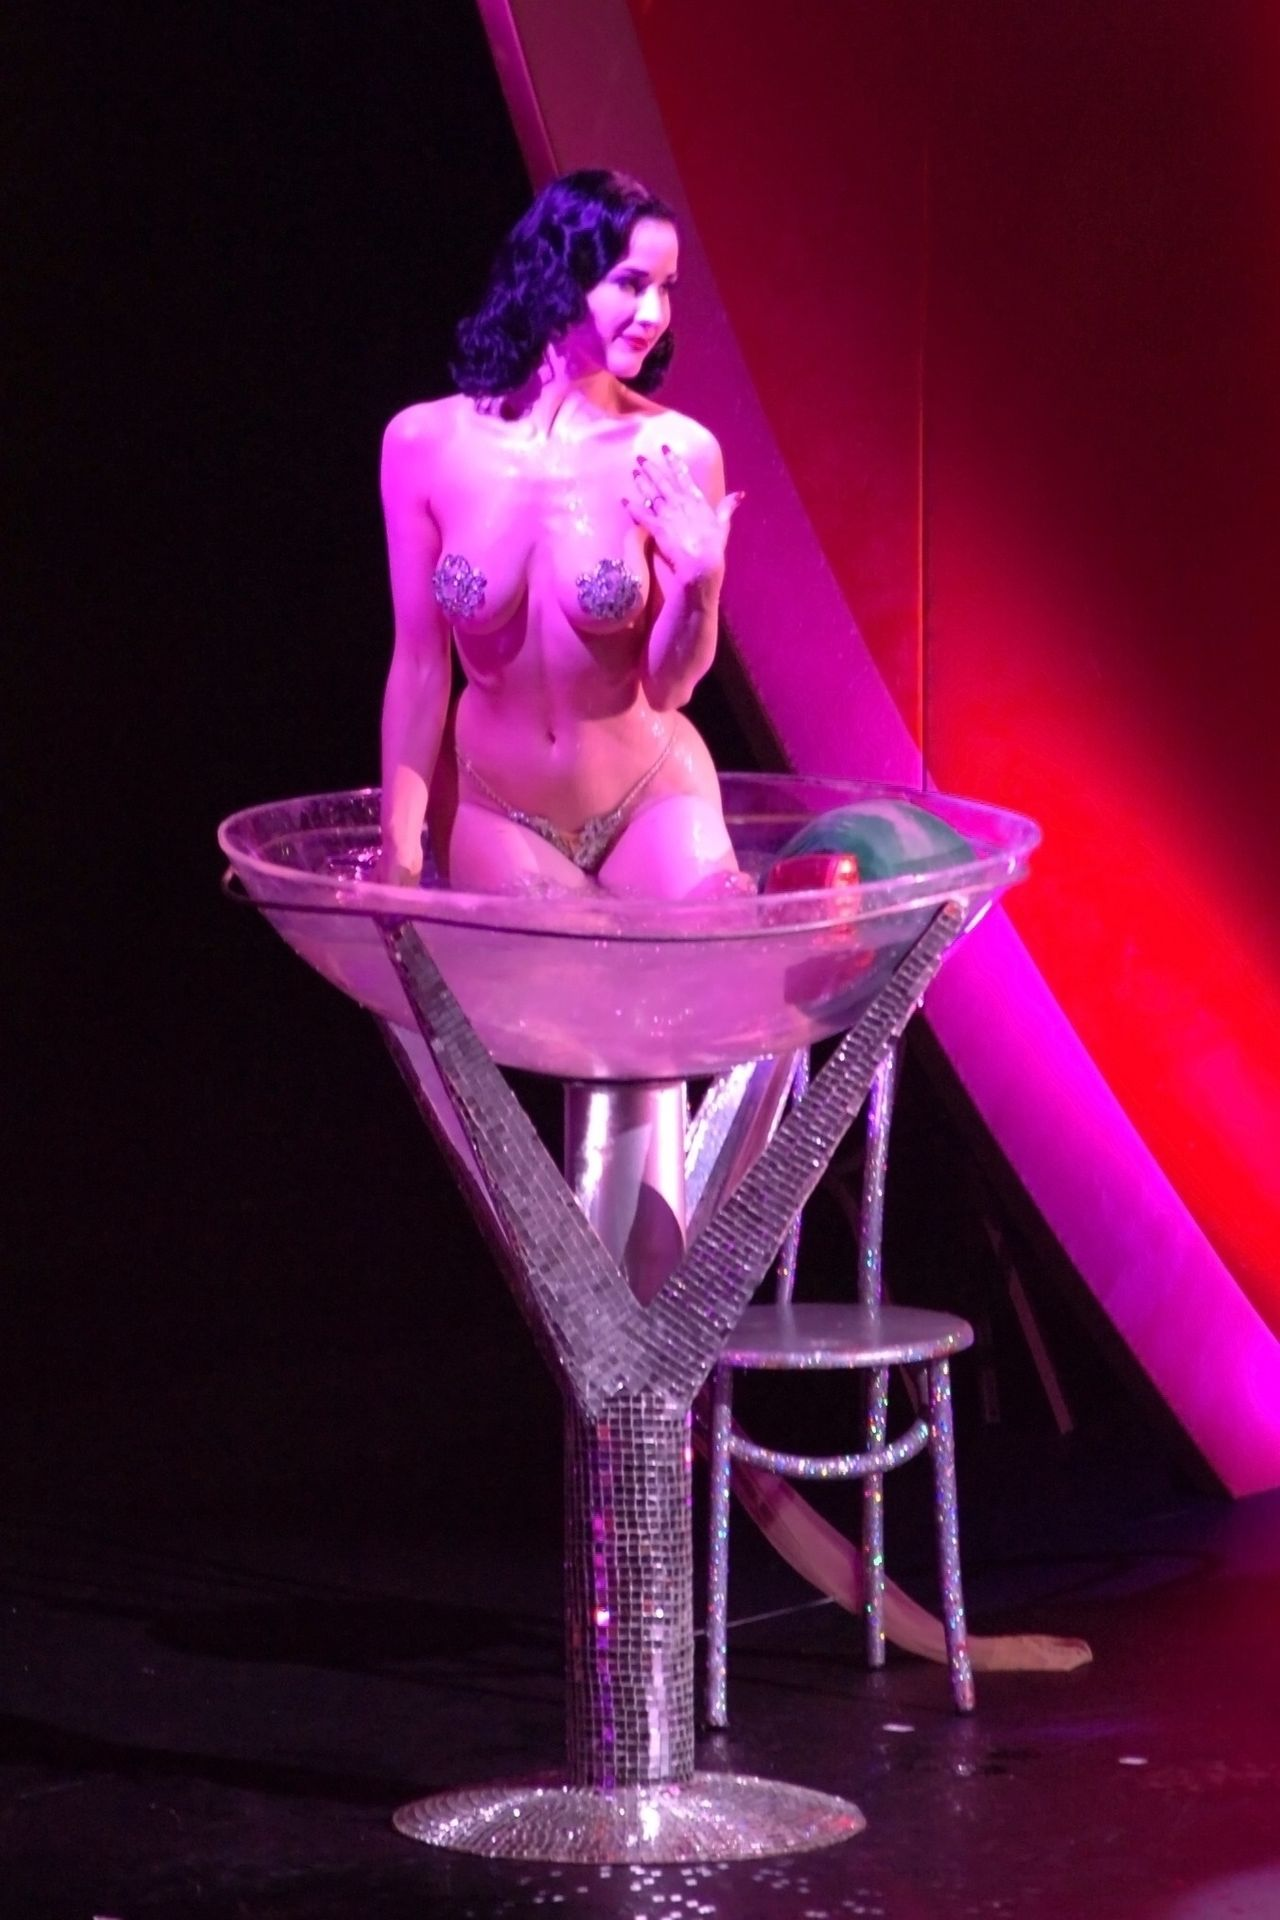 Dita Von Teese Performs At Erotica 06 In London 0033